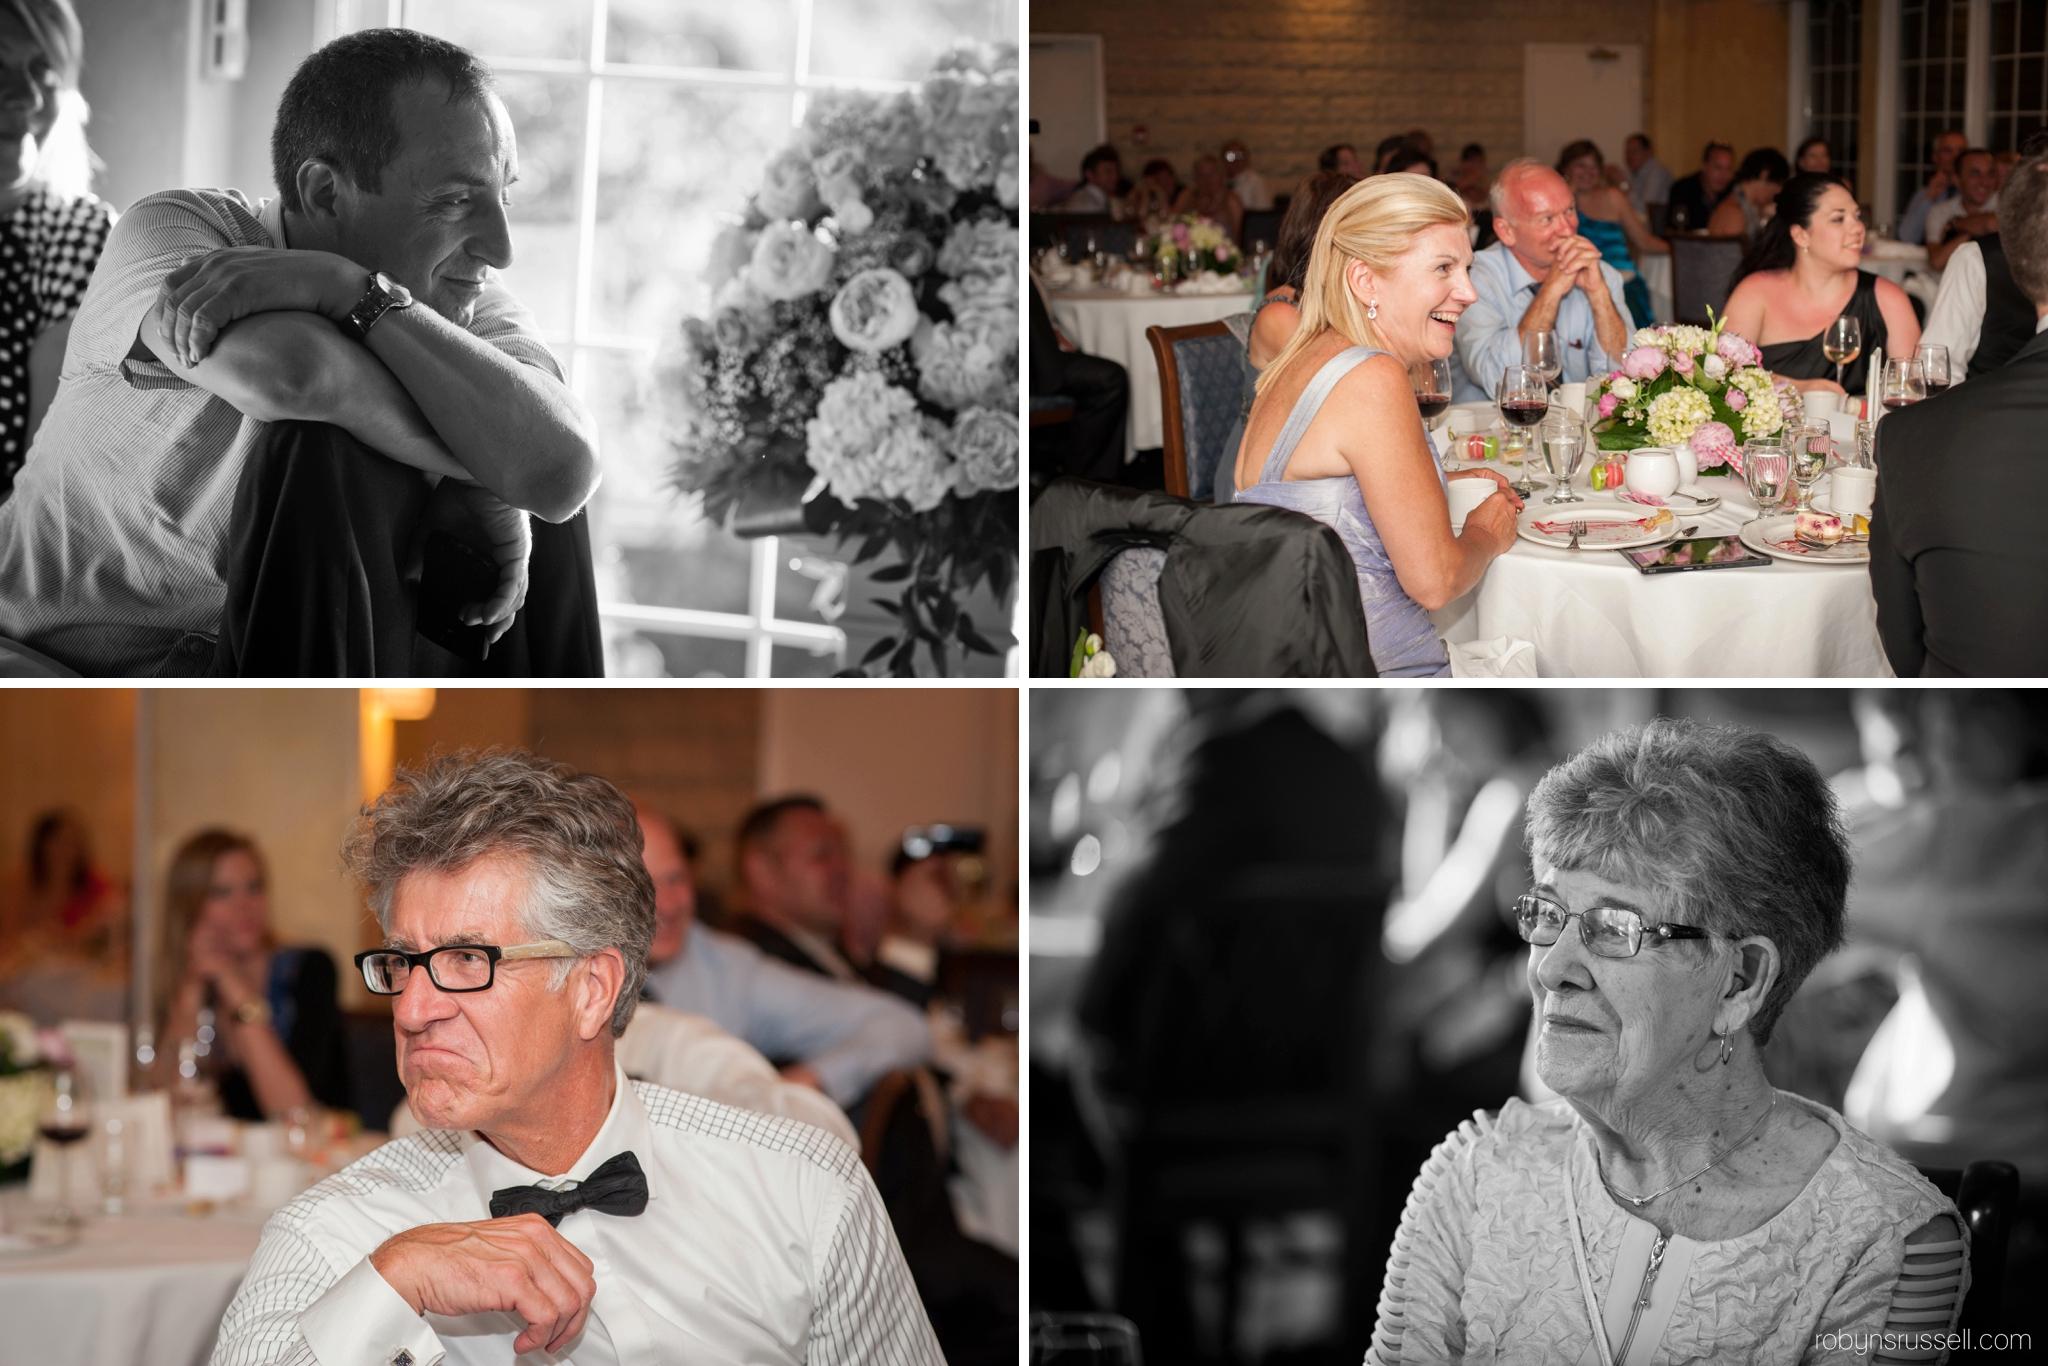 40-speeches-during-wedding-reception-at-inn-on-the-twenty.jpg